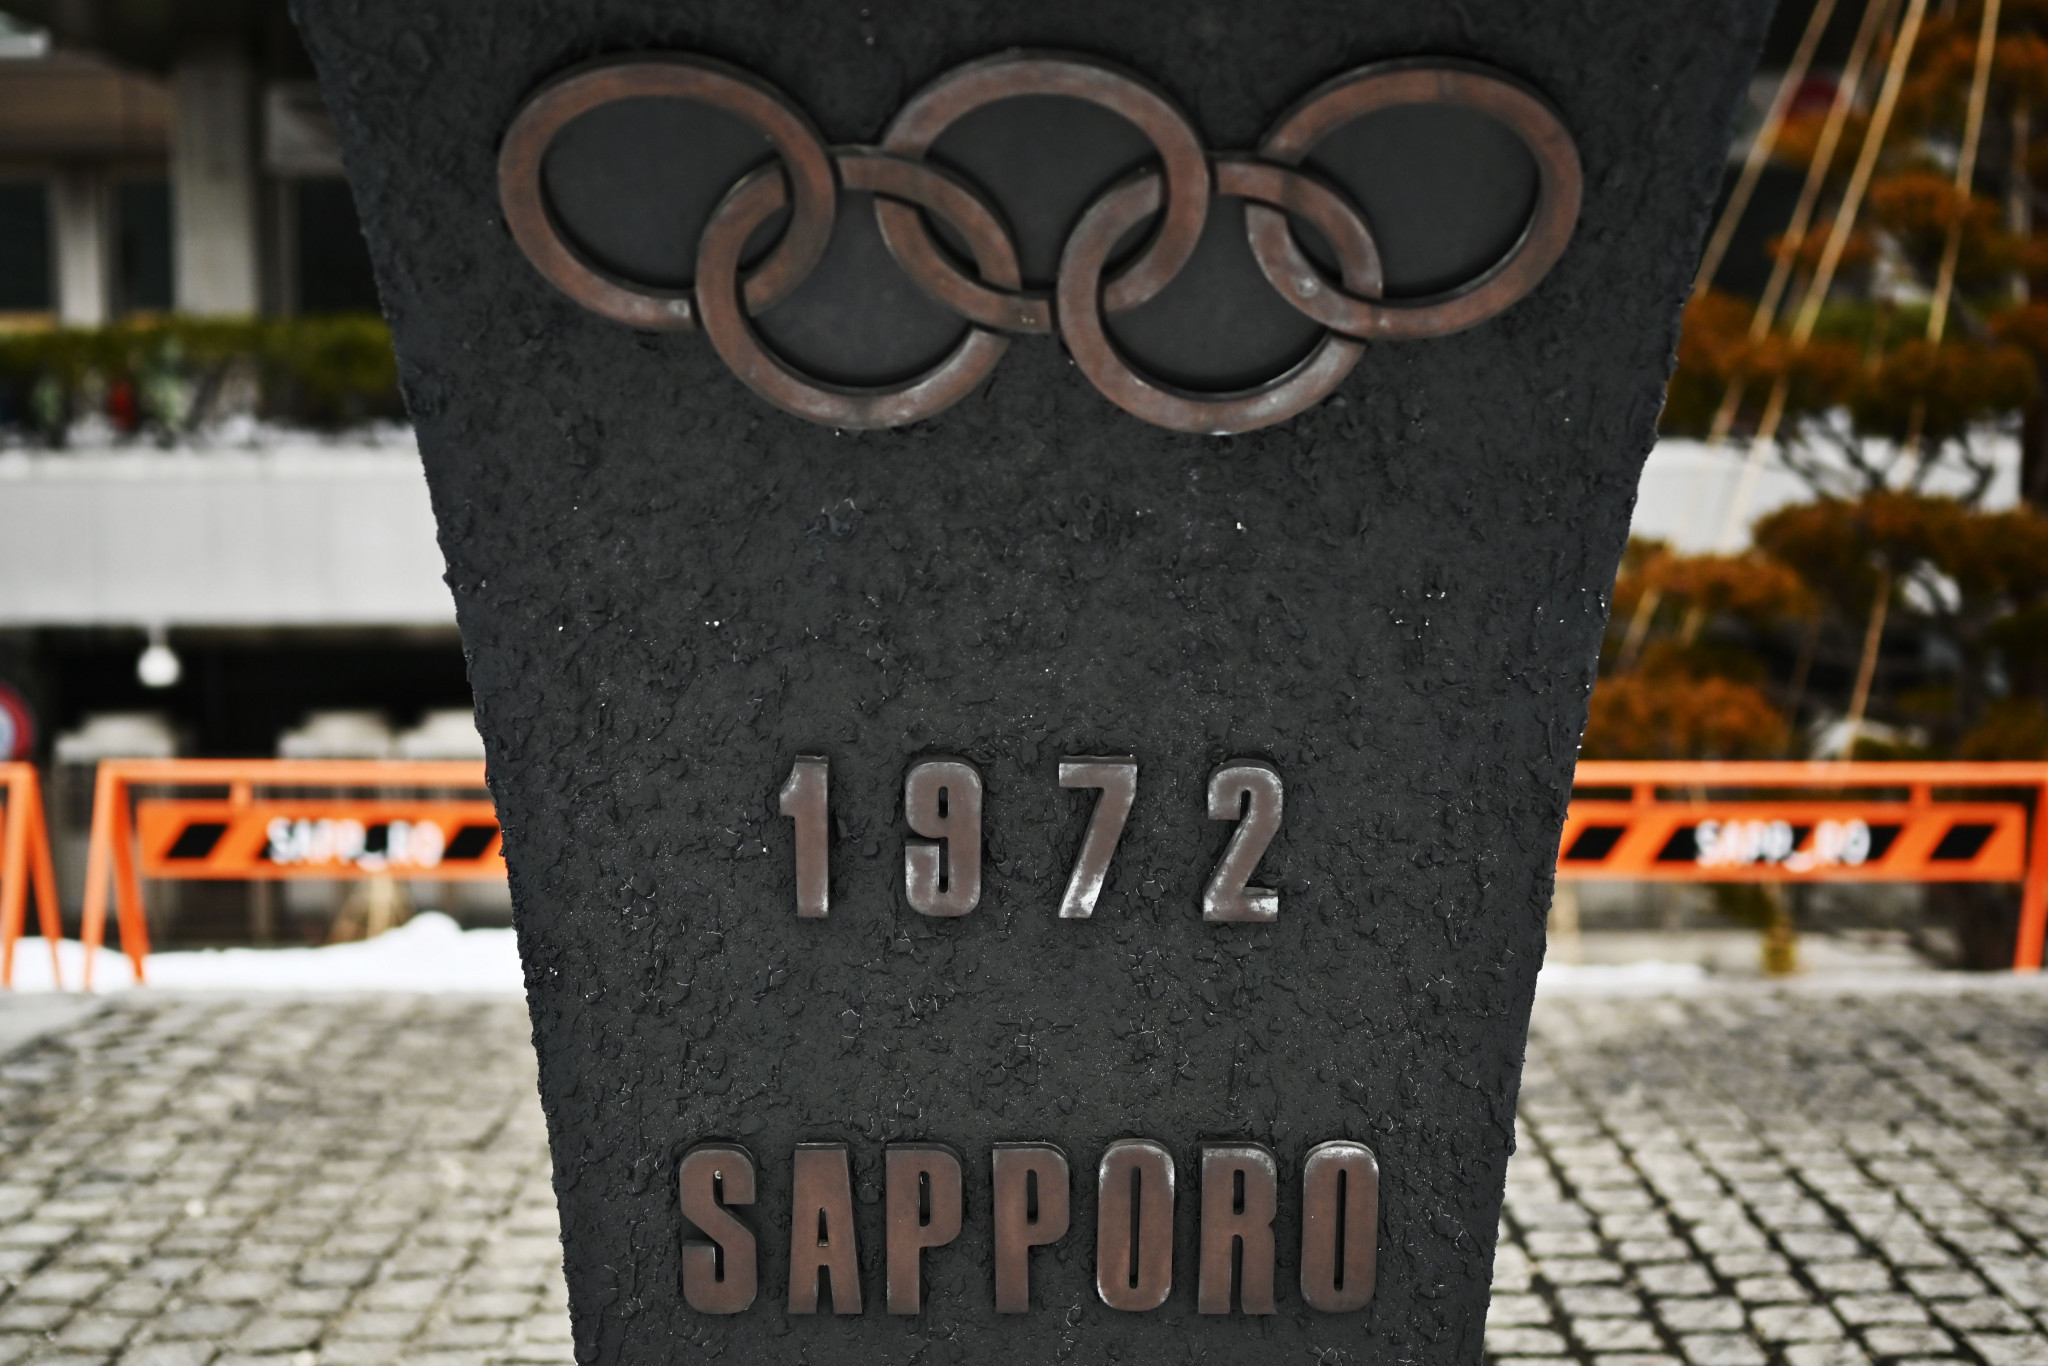 Swiss Olympic cross-country skiing medallist Giger dies age 74